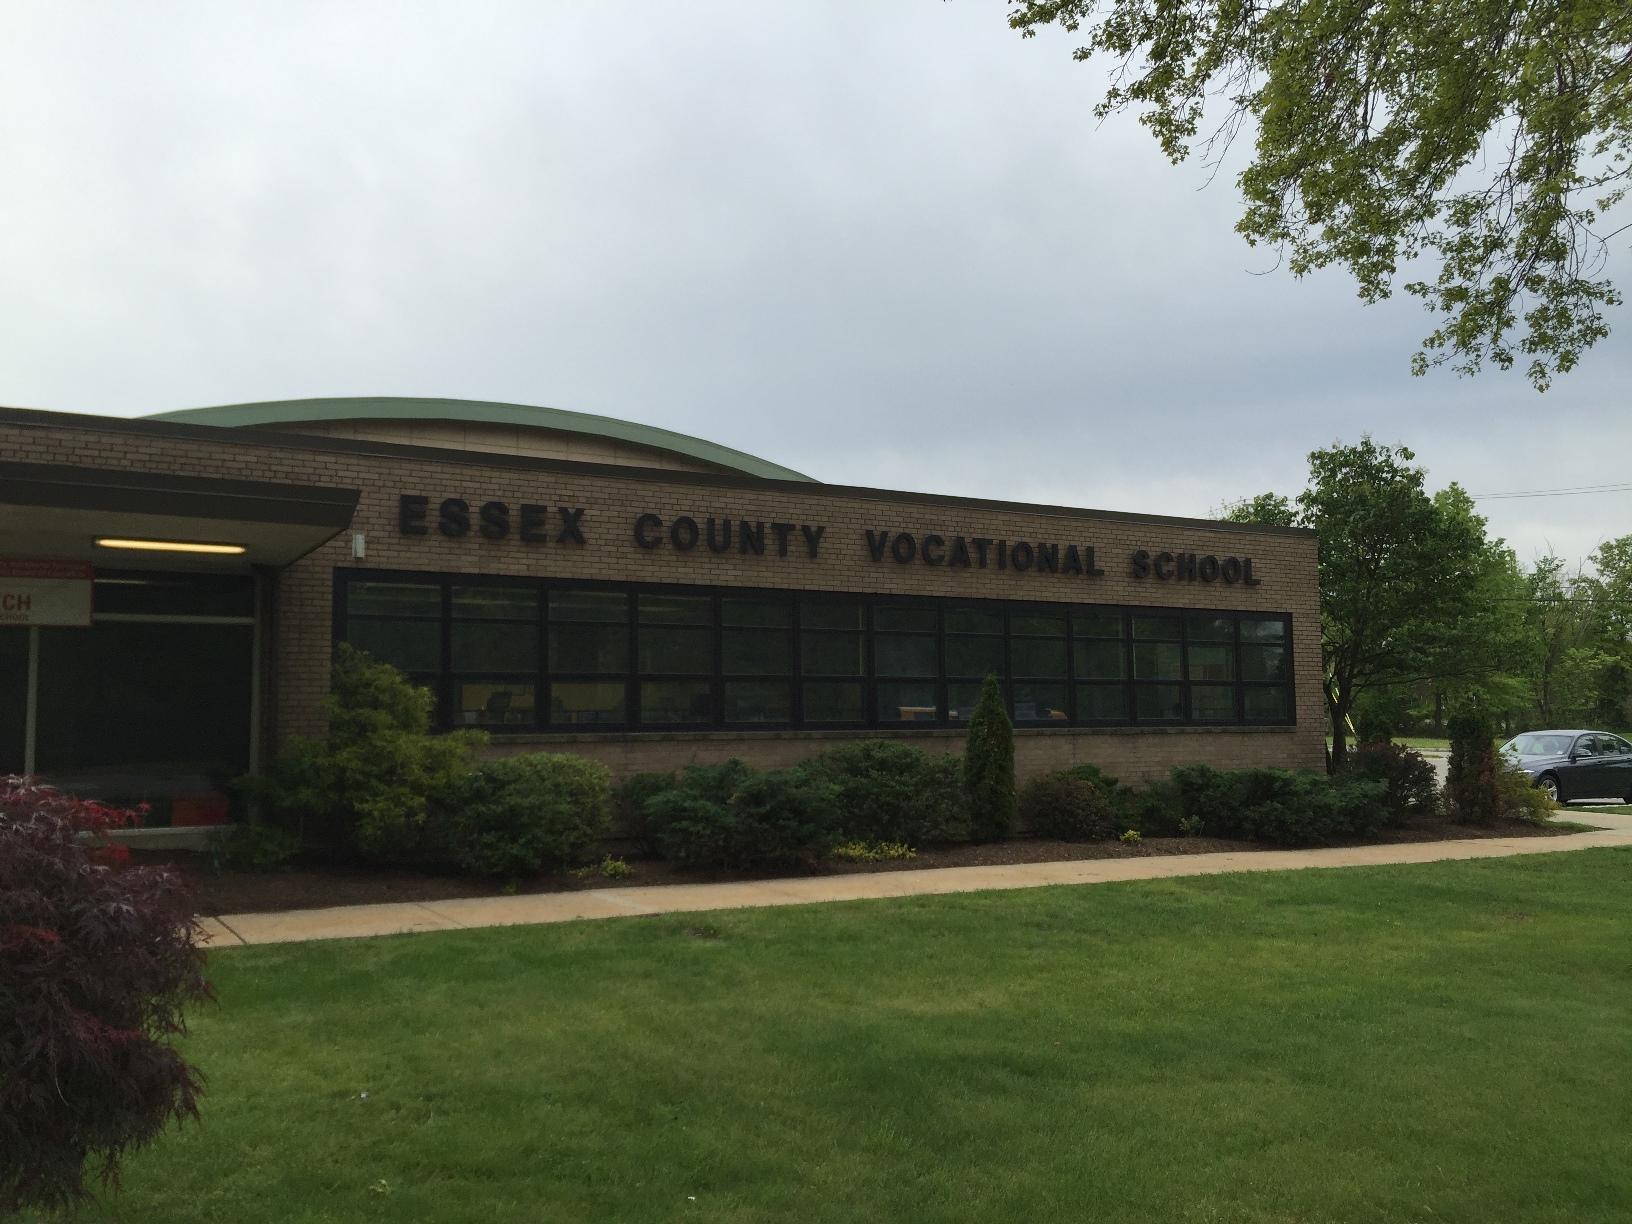 Essex County Vocational School